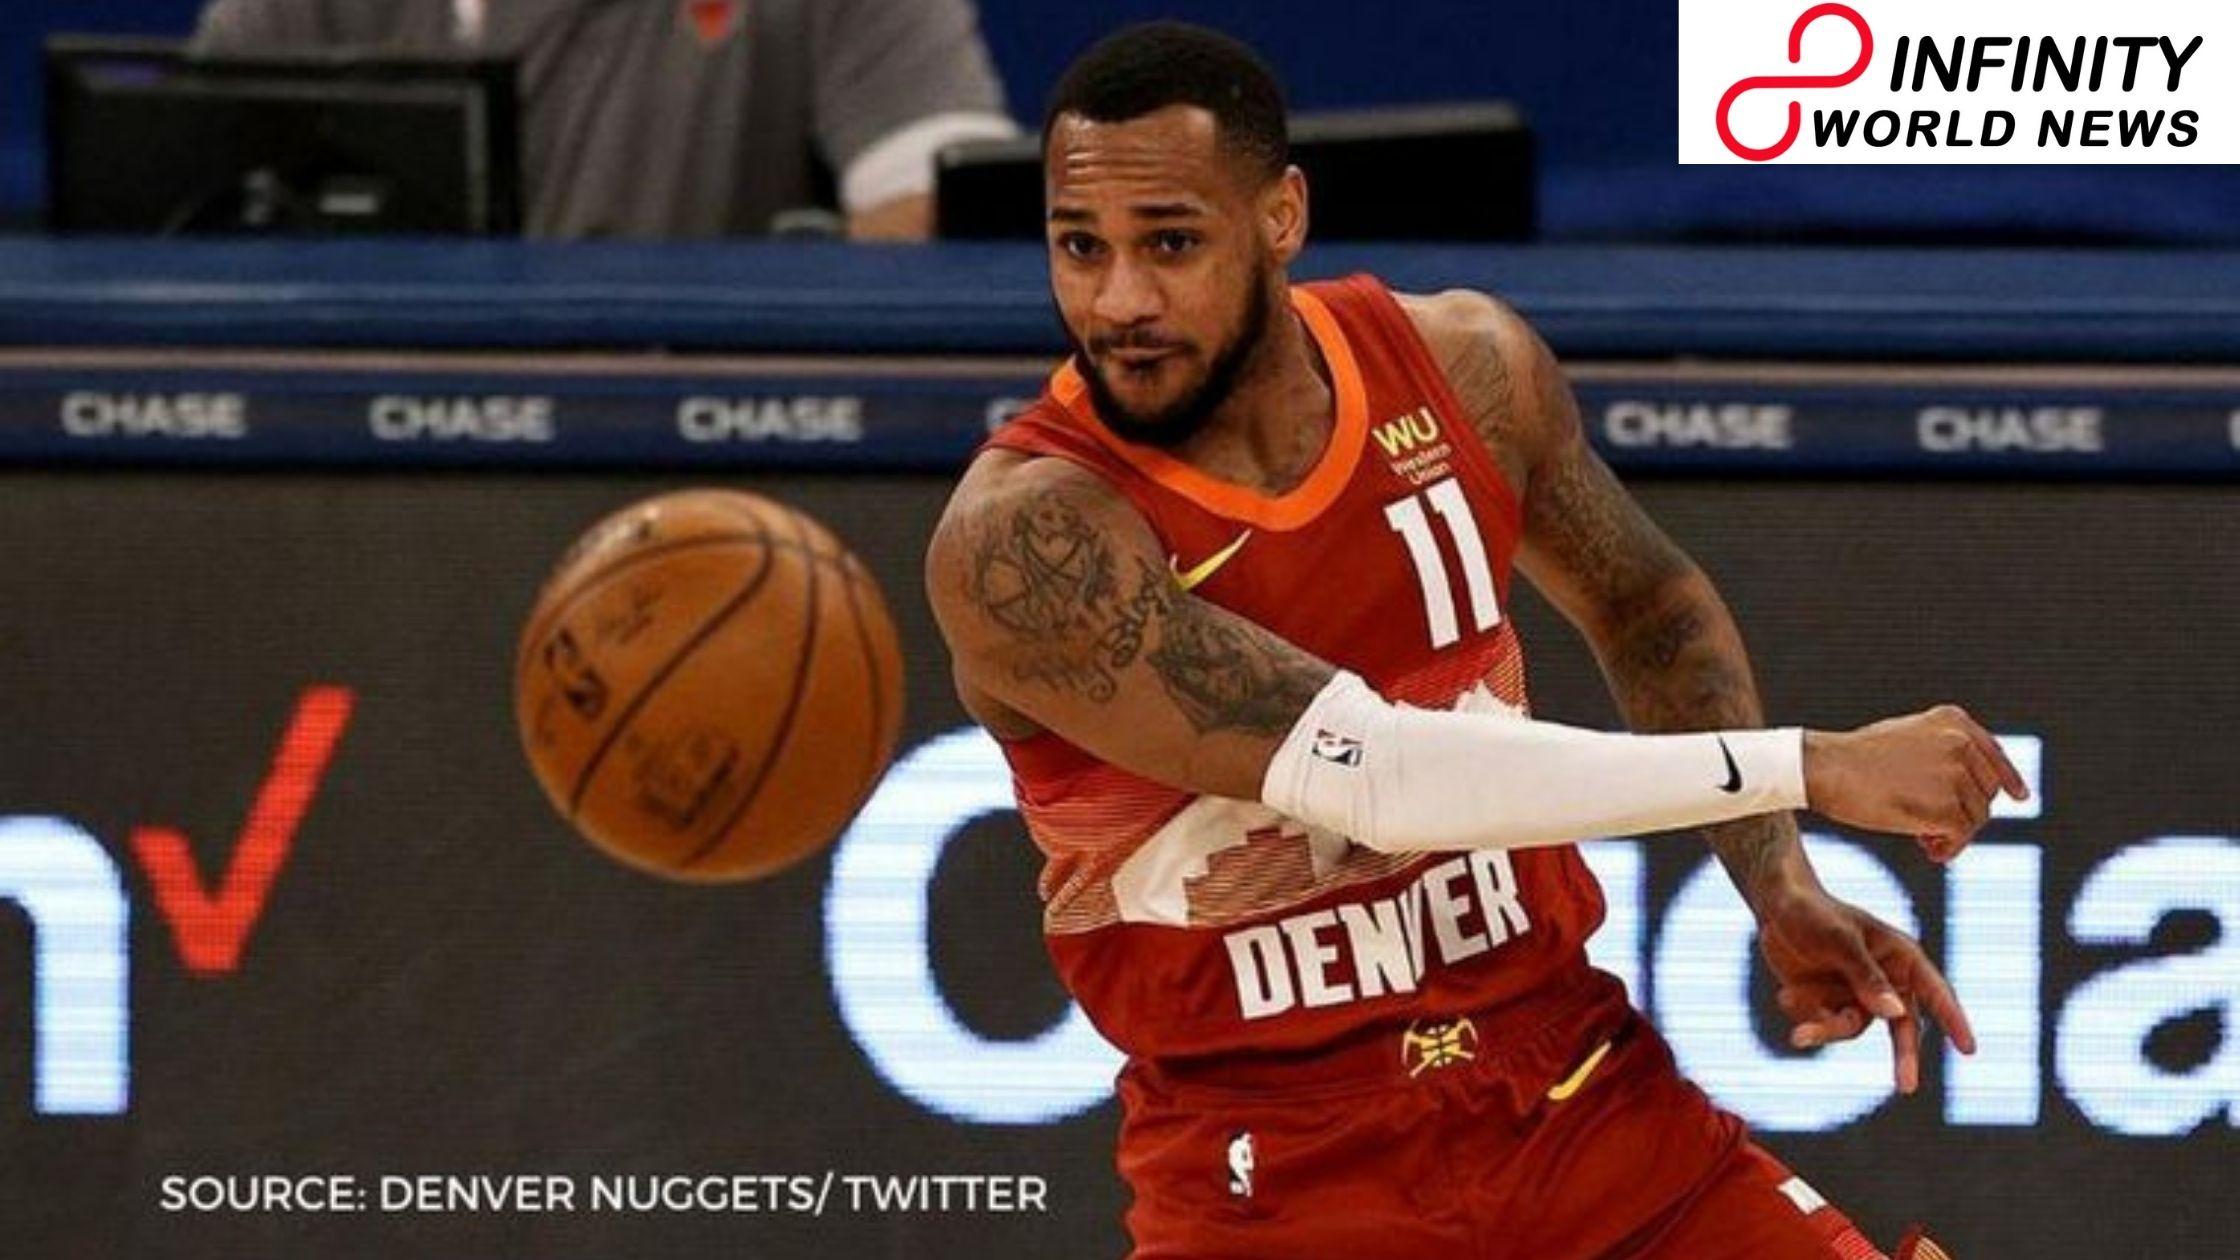 BKN vs DEN Dream11 Team Prediction Basketball, NBA Regular Season, Brooklyn Nets versus Denver Nuggets, 13 January